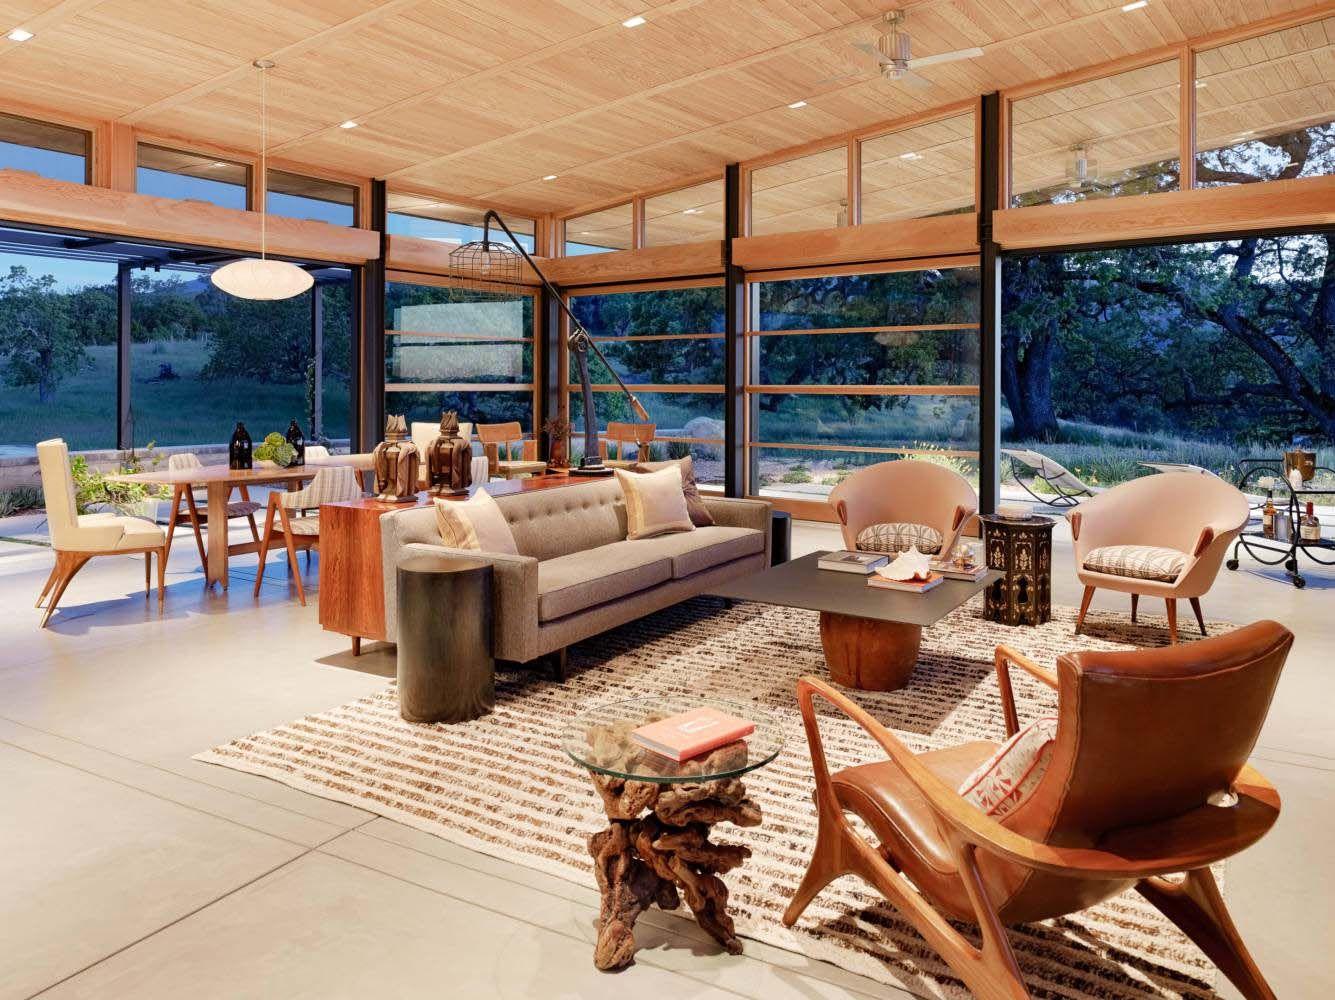 modern ranch house merges indooroutdoor living in santa